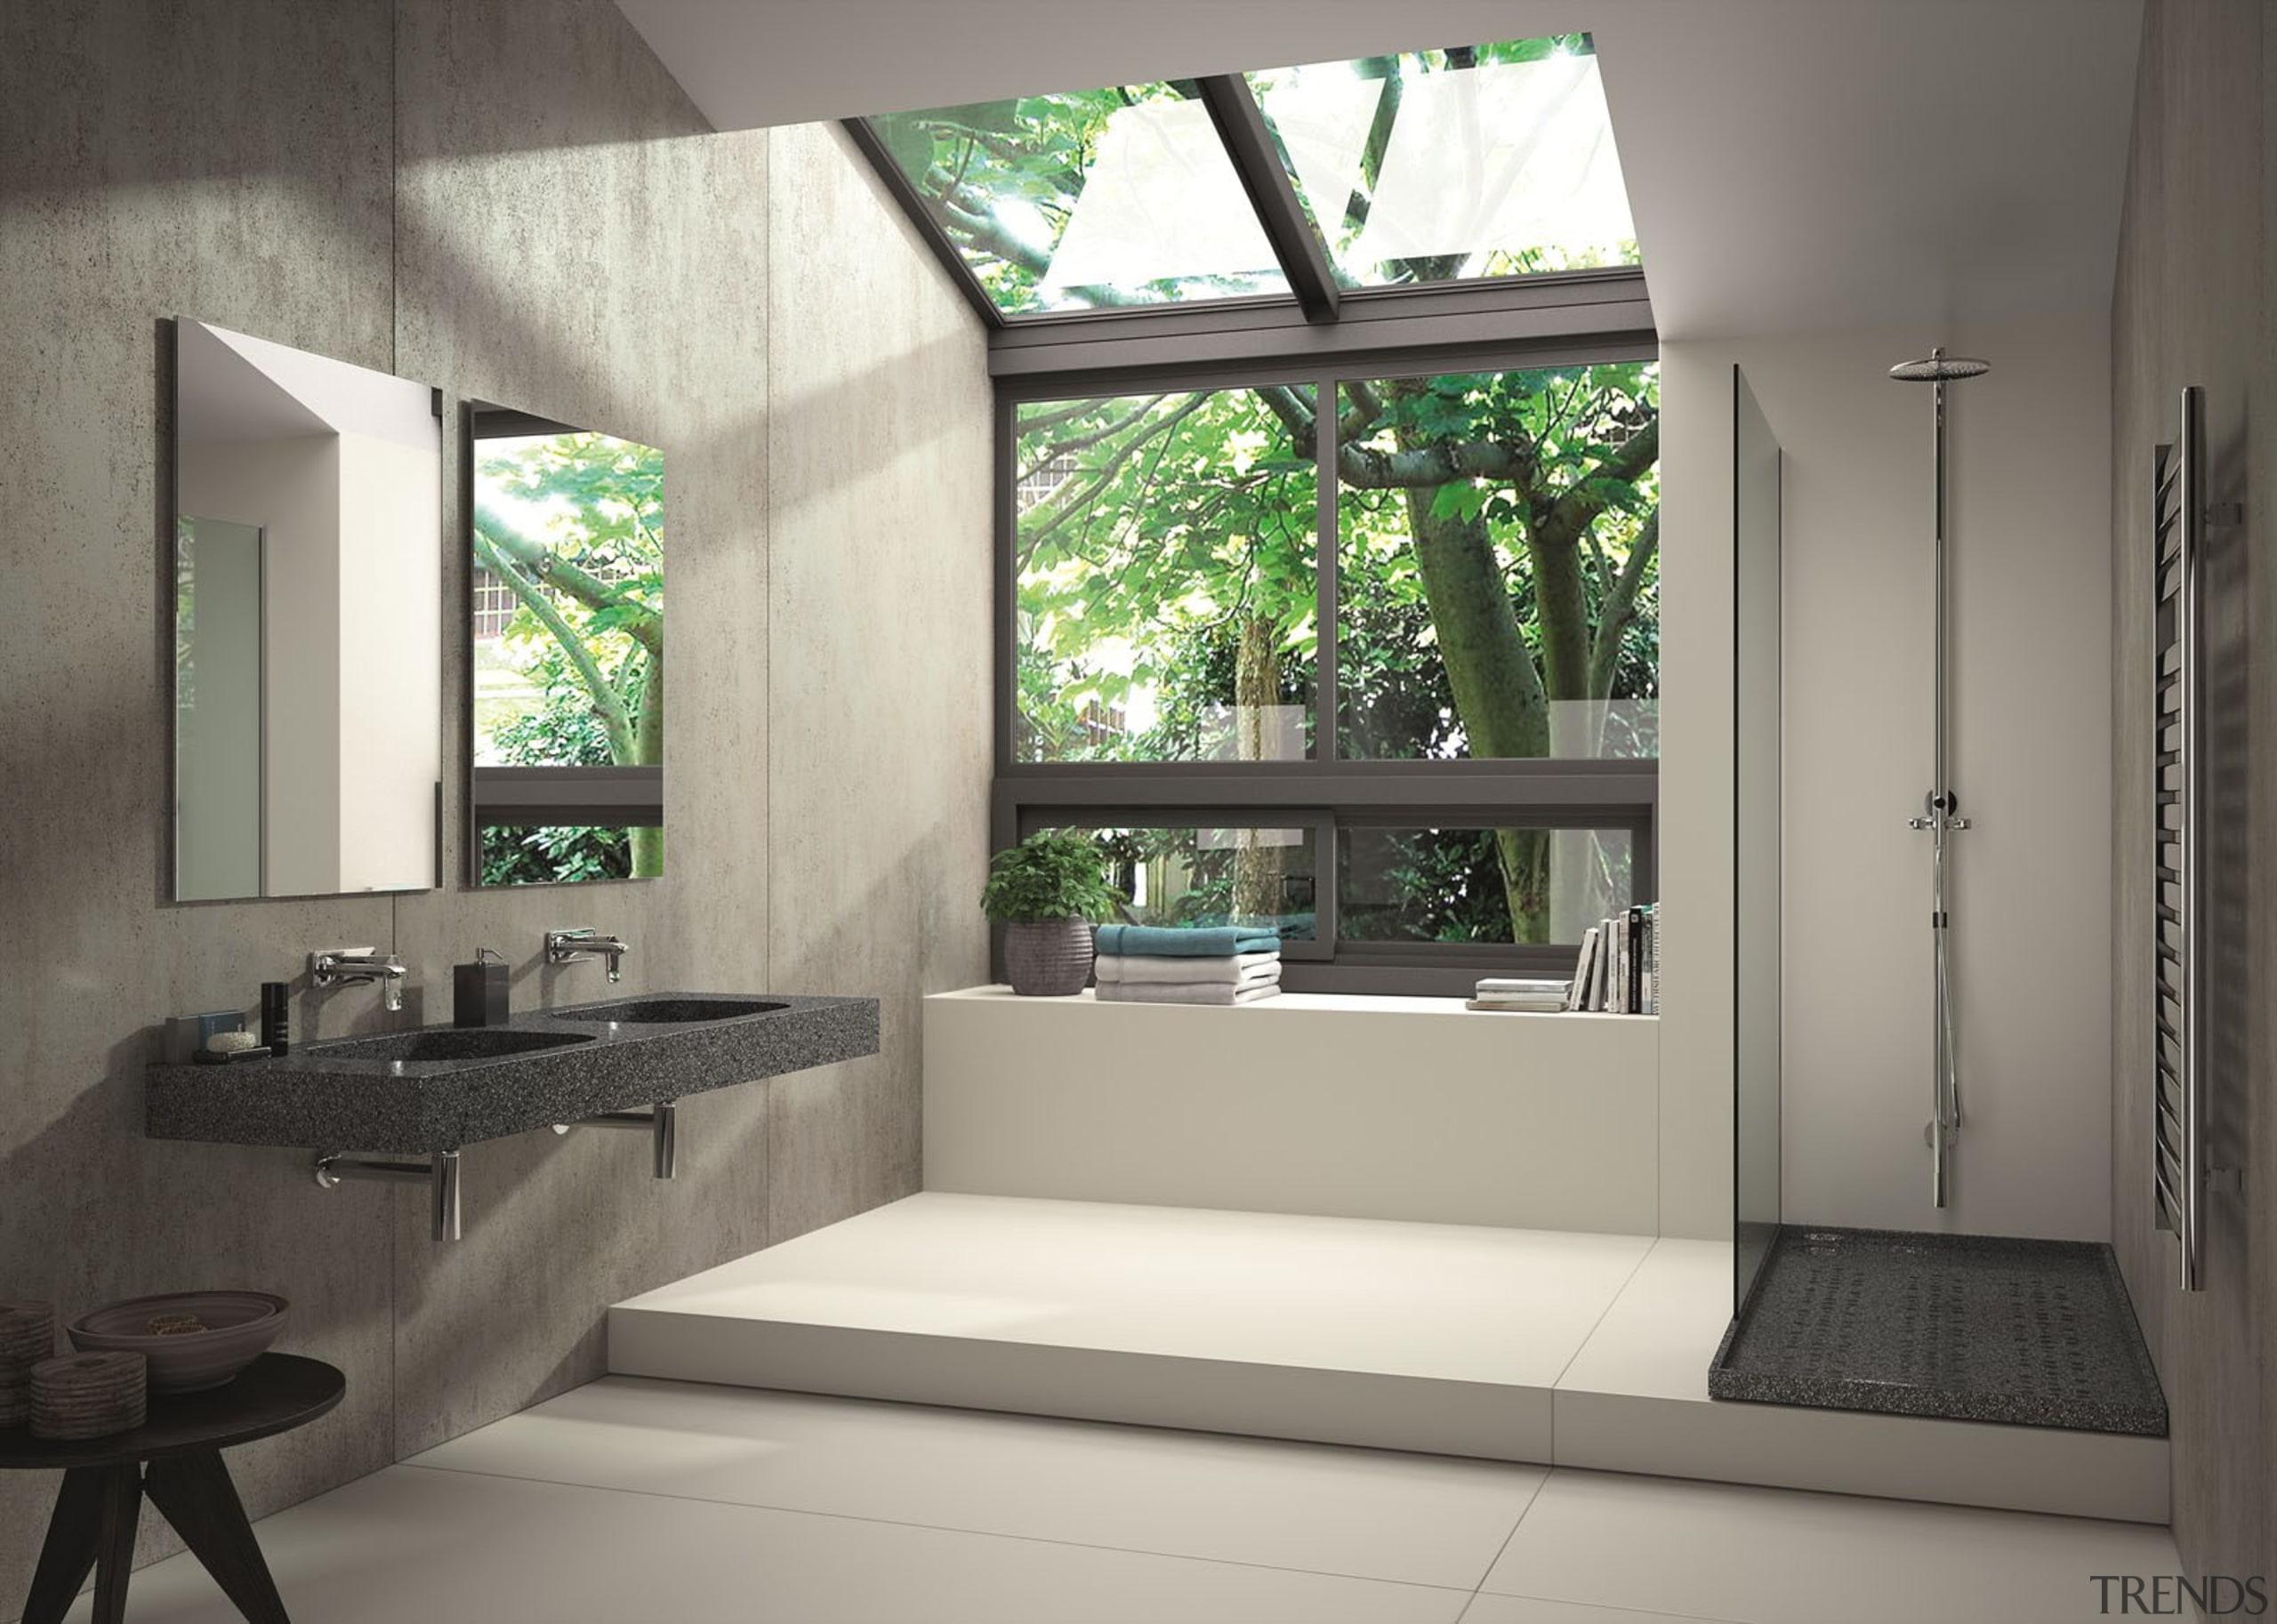 Ambiente baño vivienda -  Lavabo Exclusive Silestone architecture, bathroom, house, interior design, window, gray